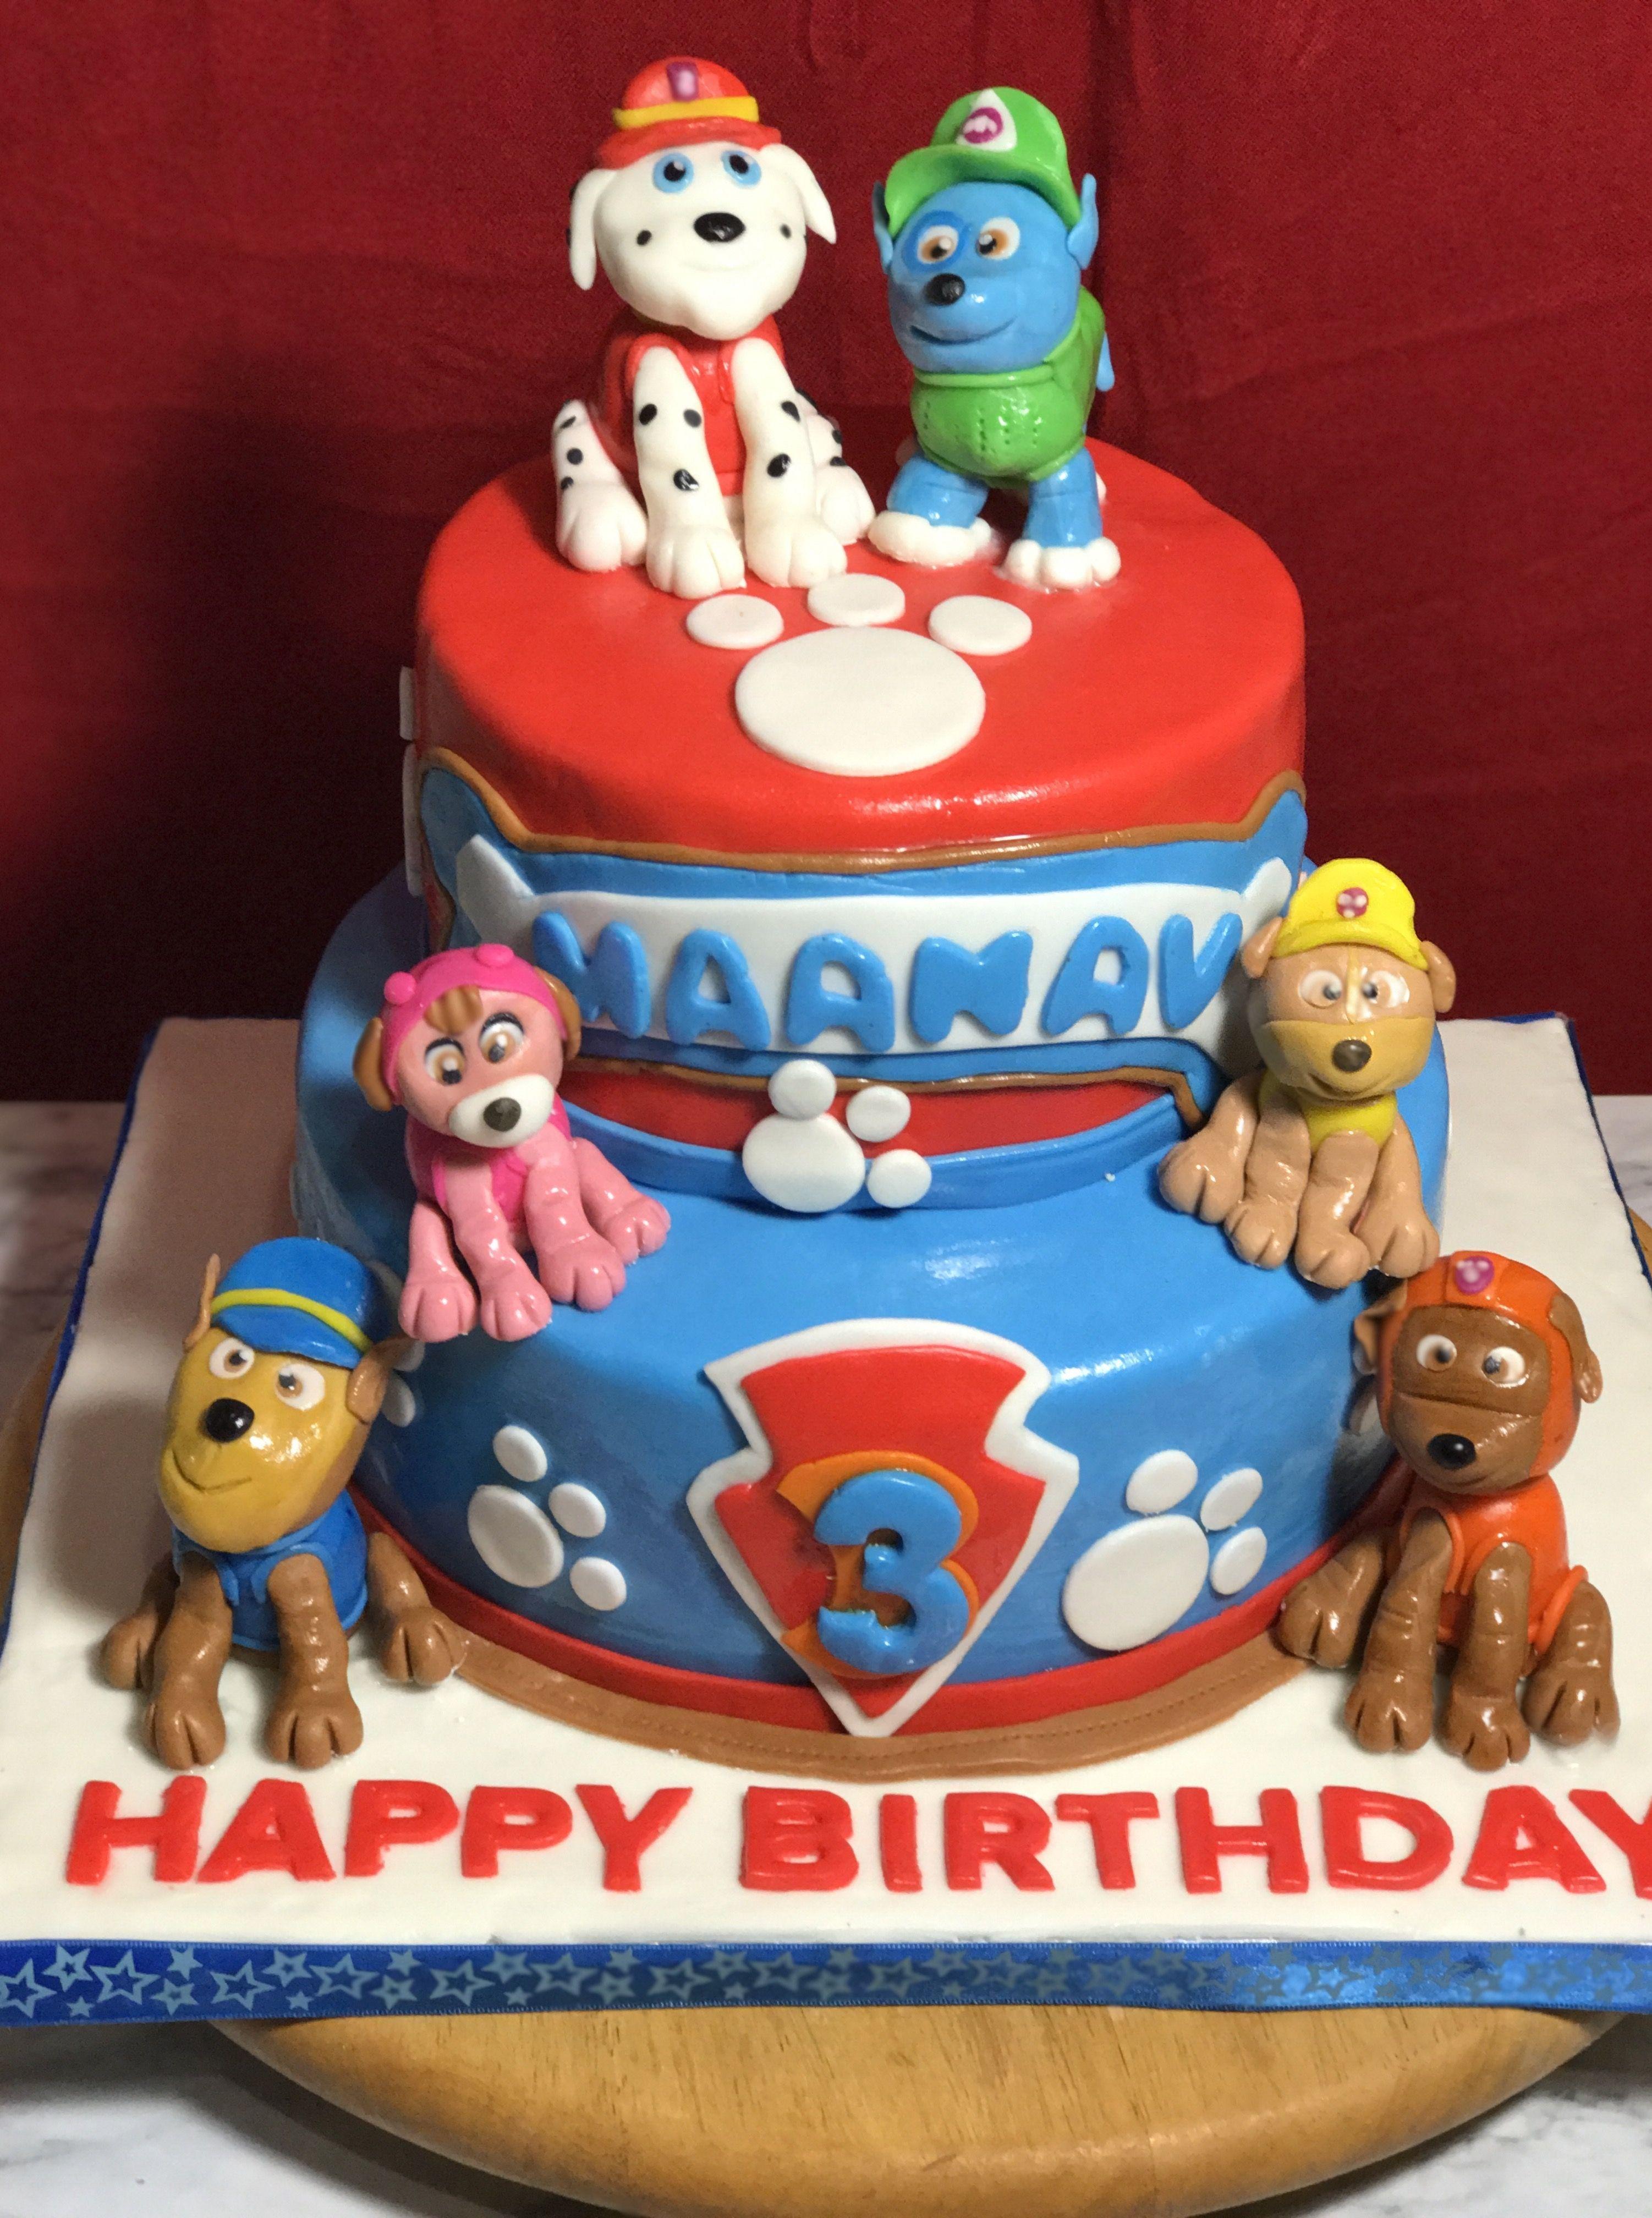 Pin by Freshnfancy Cakes on Freshnfancy Cakes | Cake, Cake ...